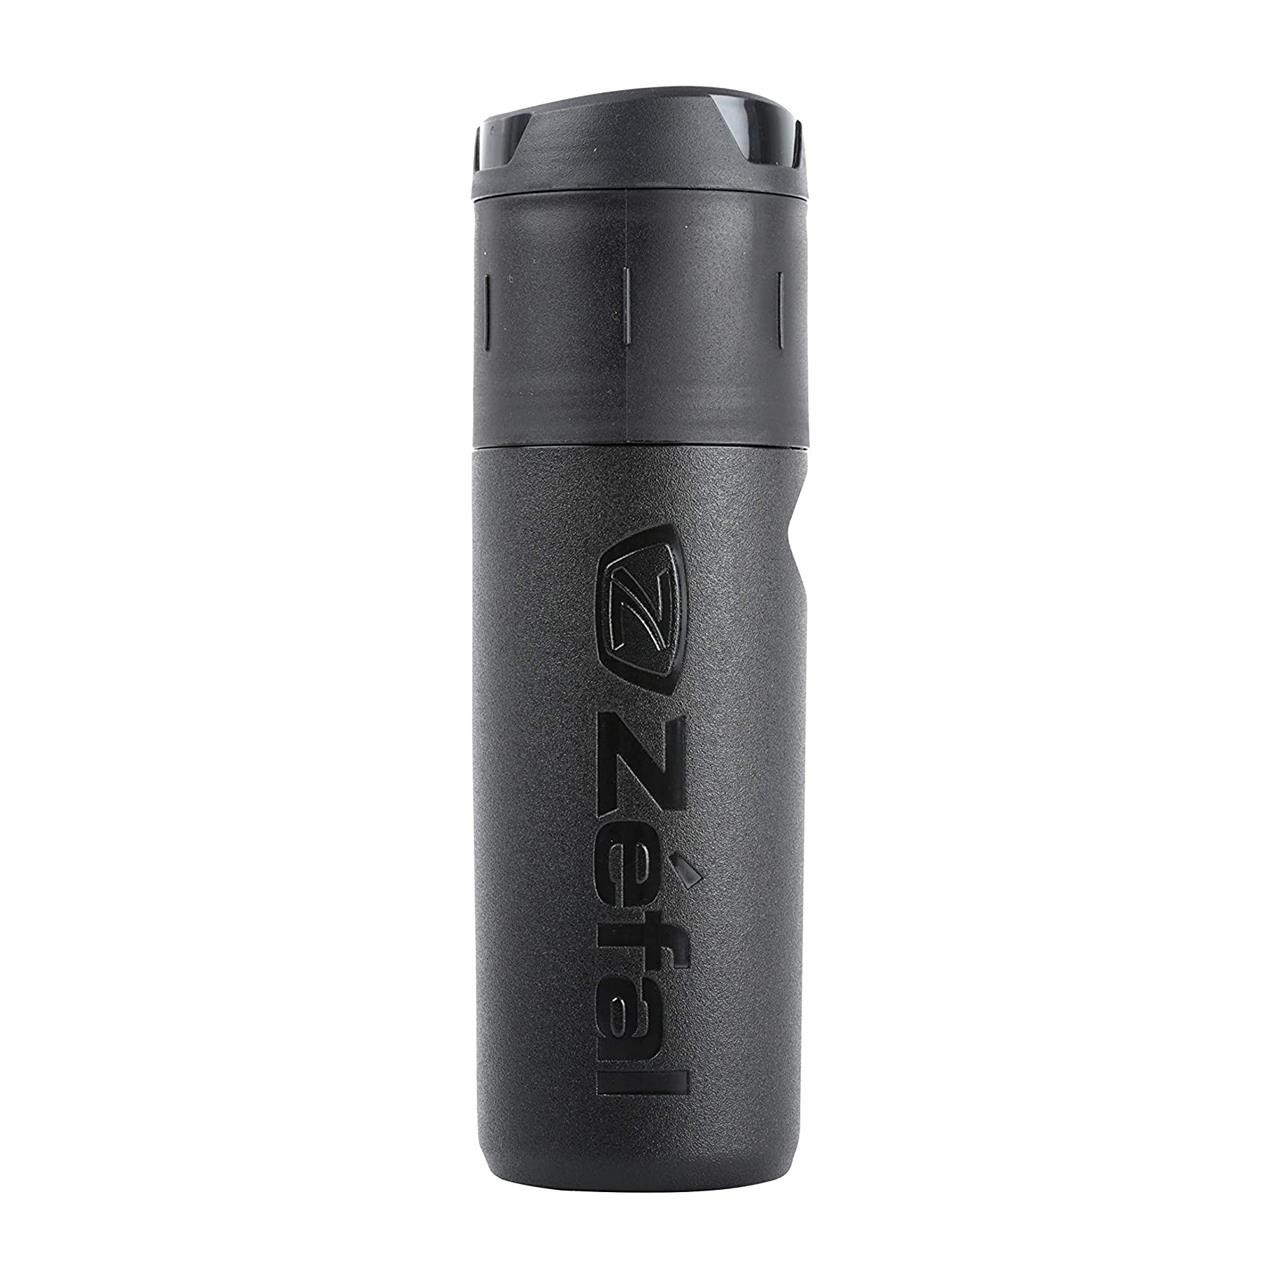 Zefal Z Box Tool Bottle (Black, Large)